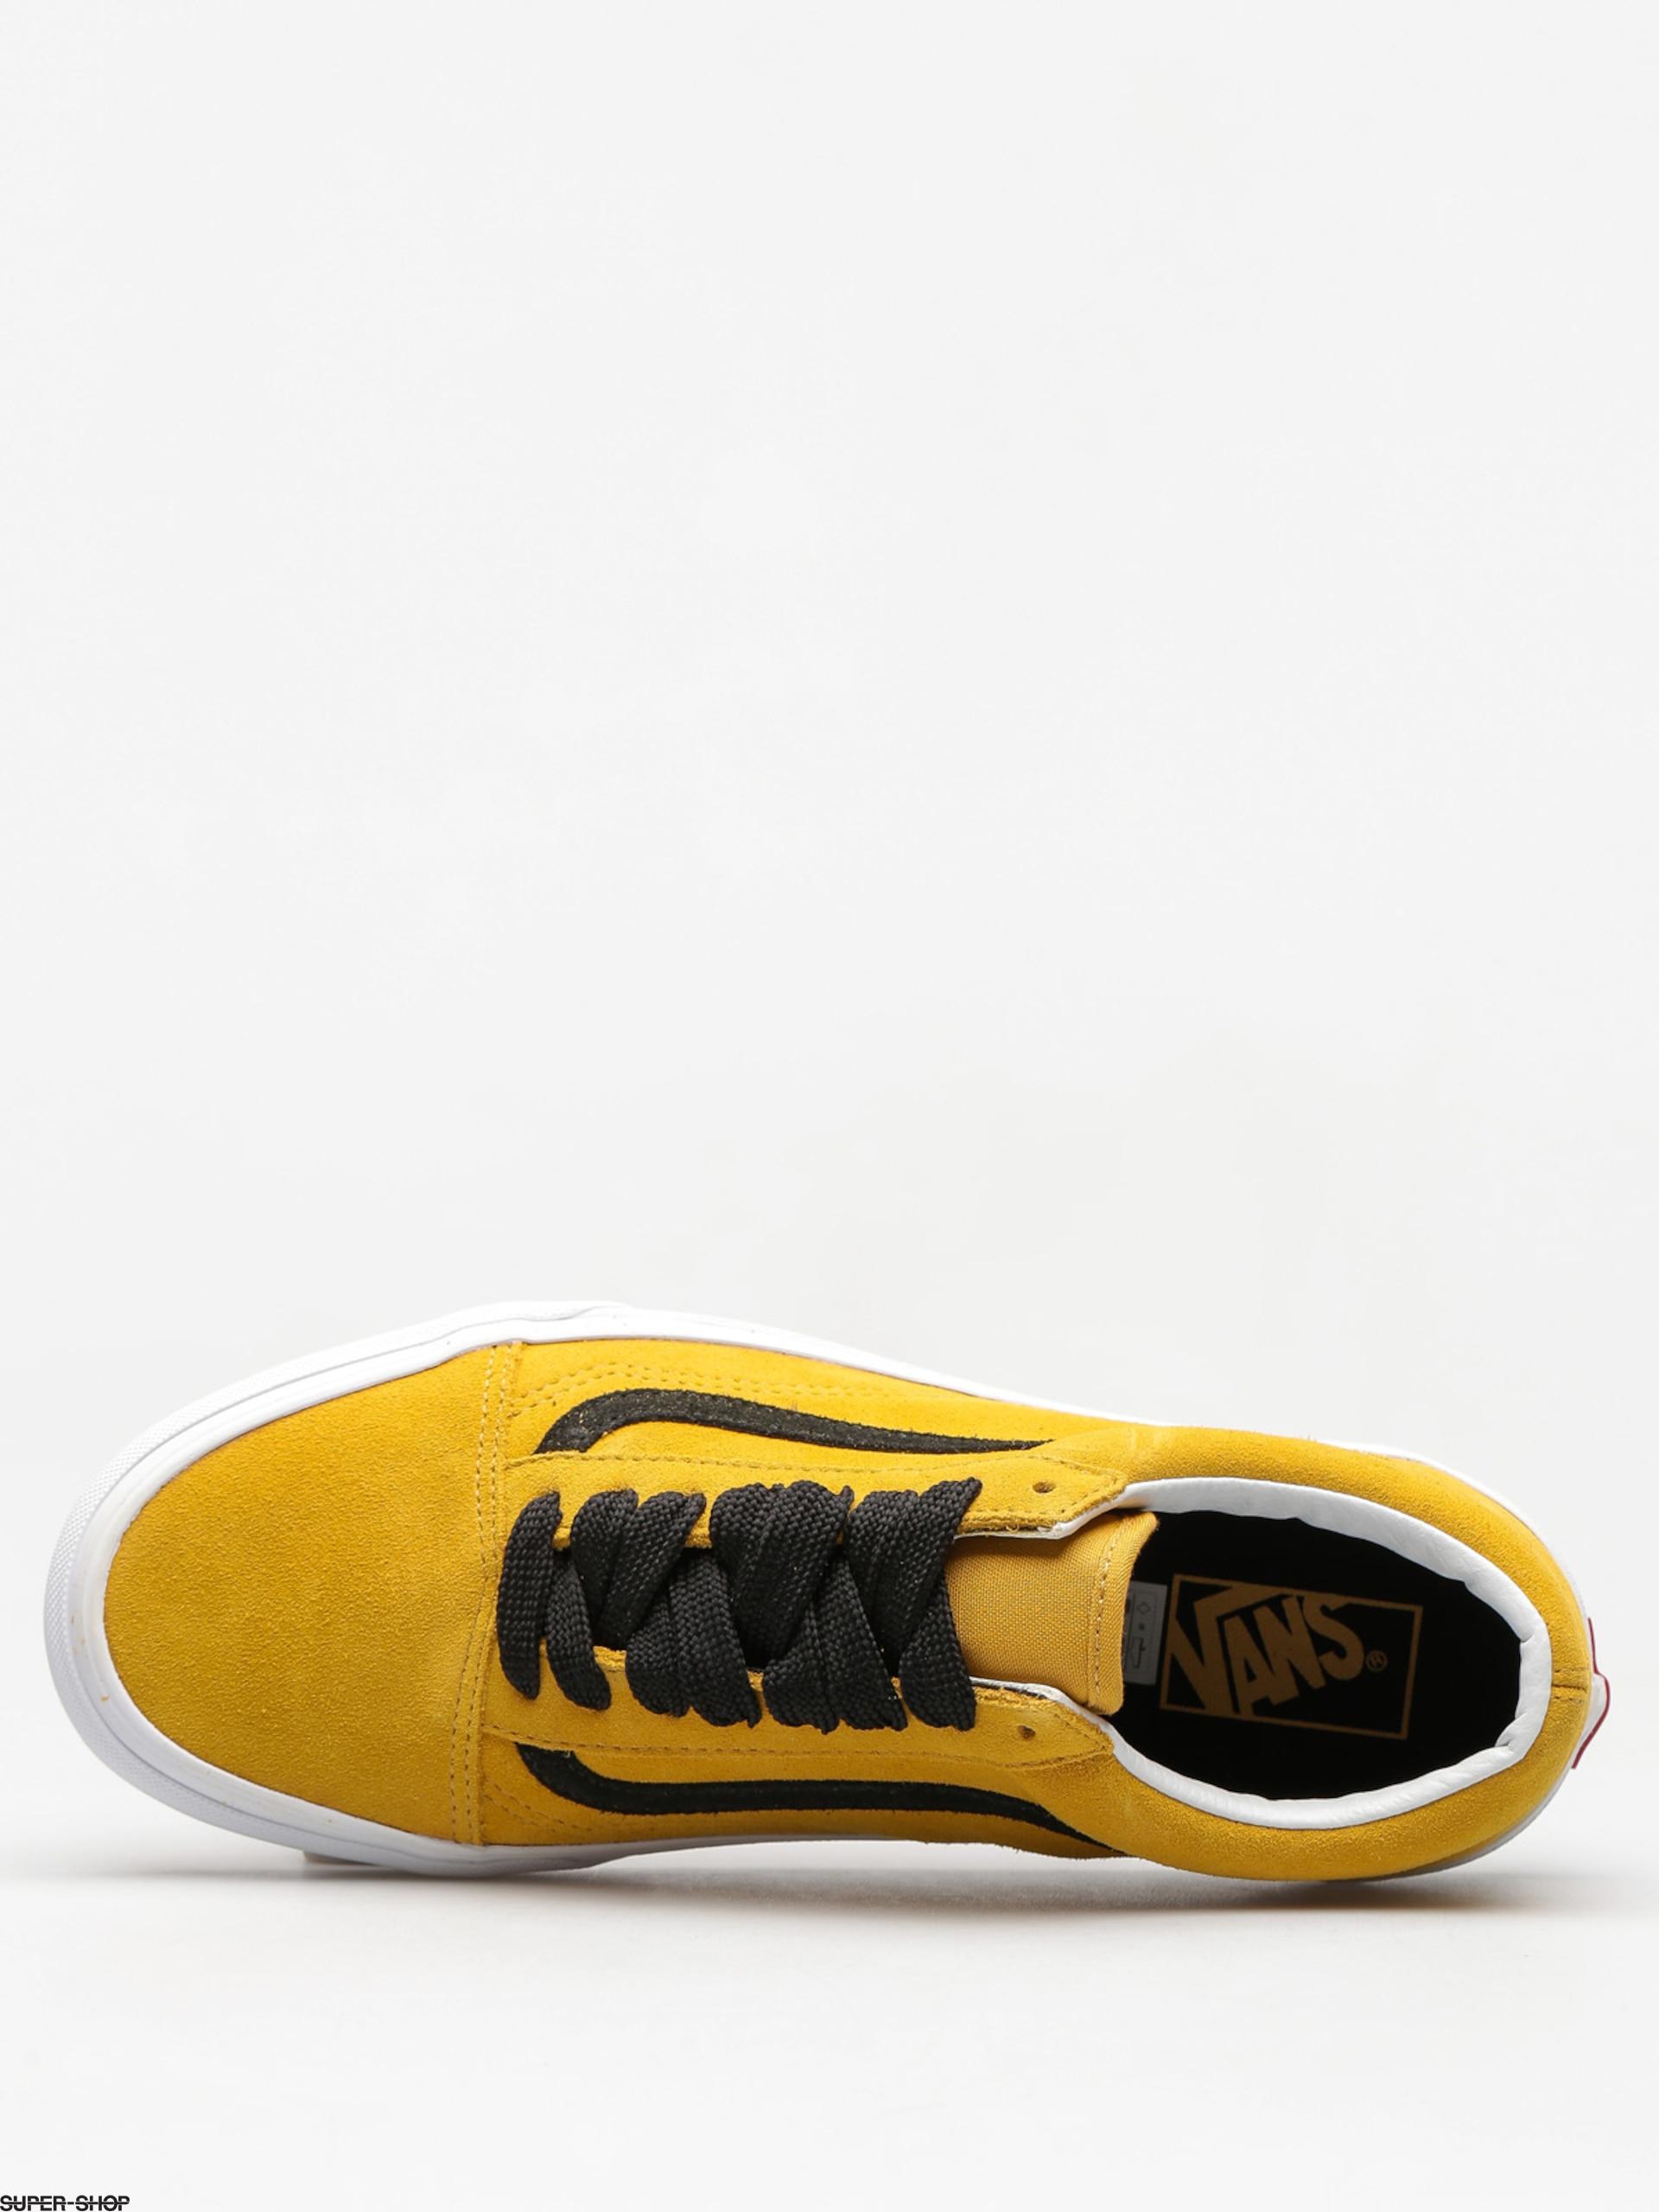 ed289888c4f Vans Shoes Old Skool (oversized lace tawny olive black)